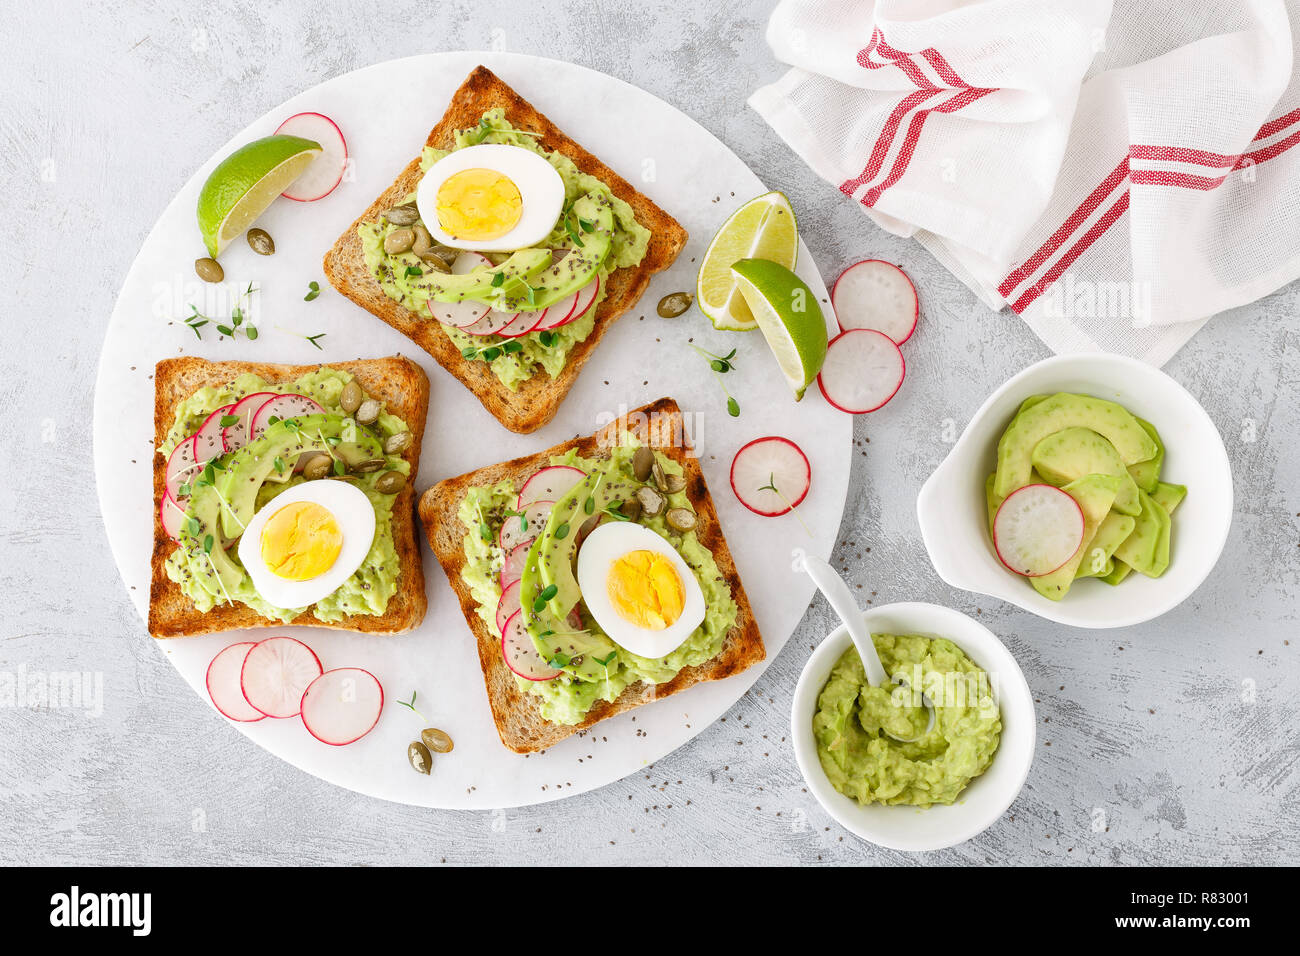 guacamole plant based foods diet